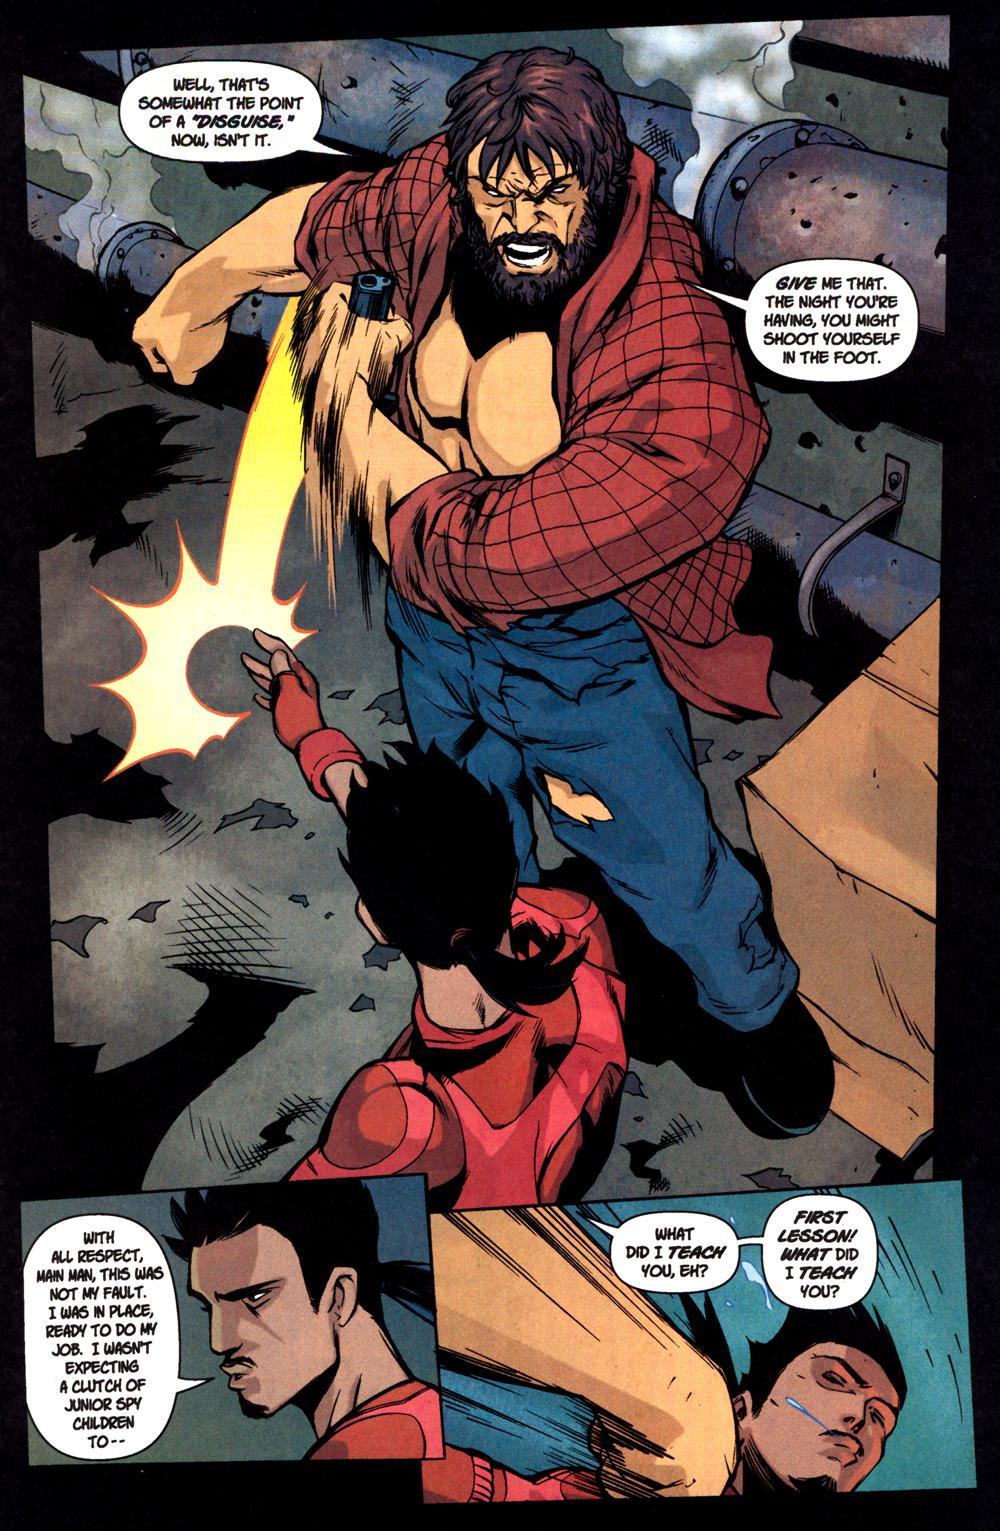 Read online SpyBoy: Final Exam comic -  Issue #1 - 15